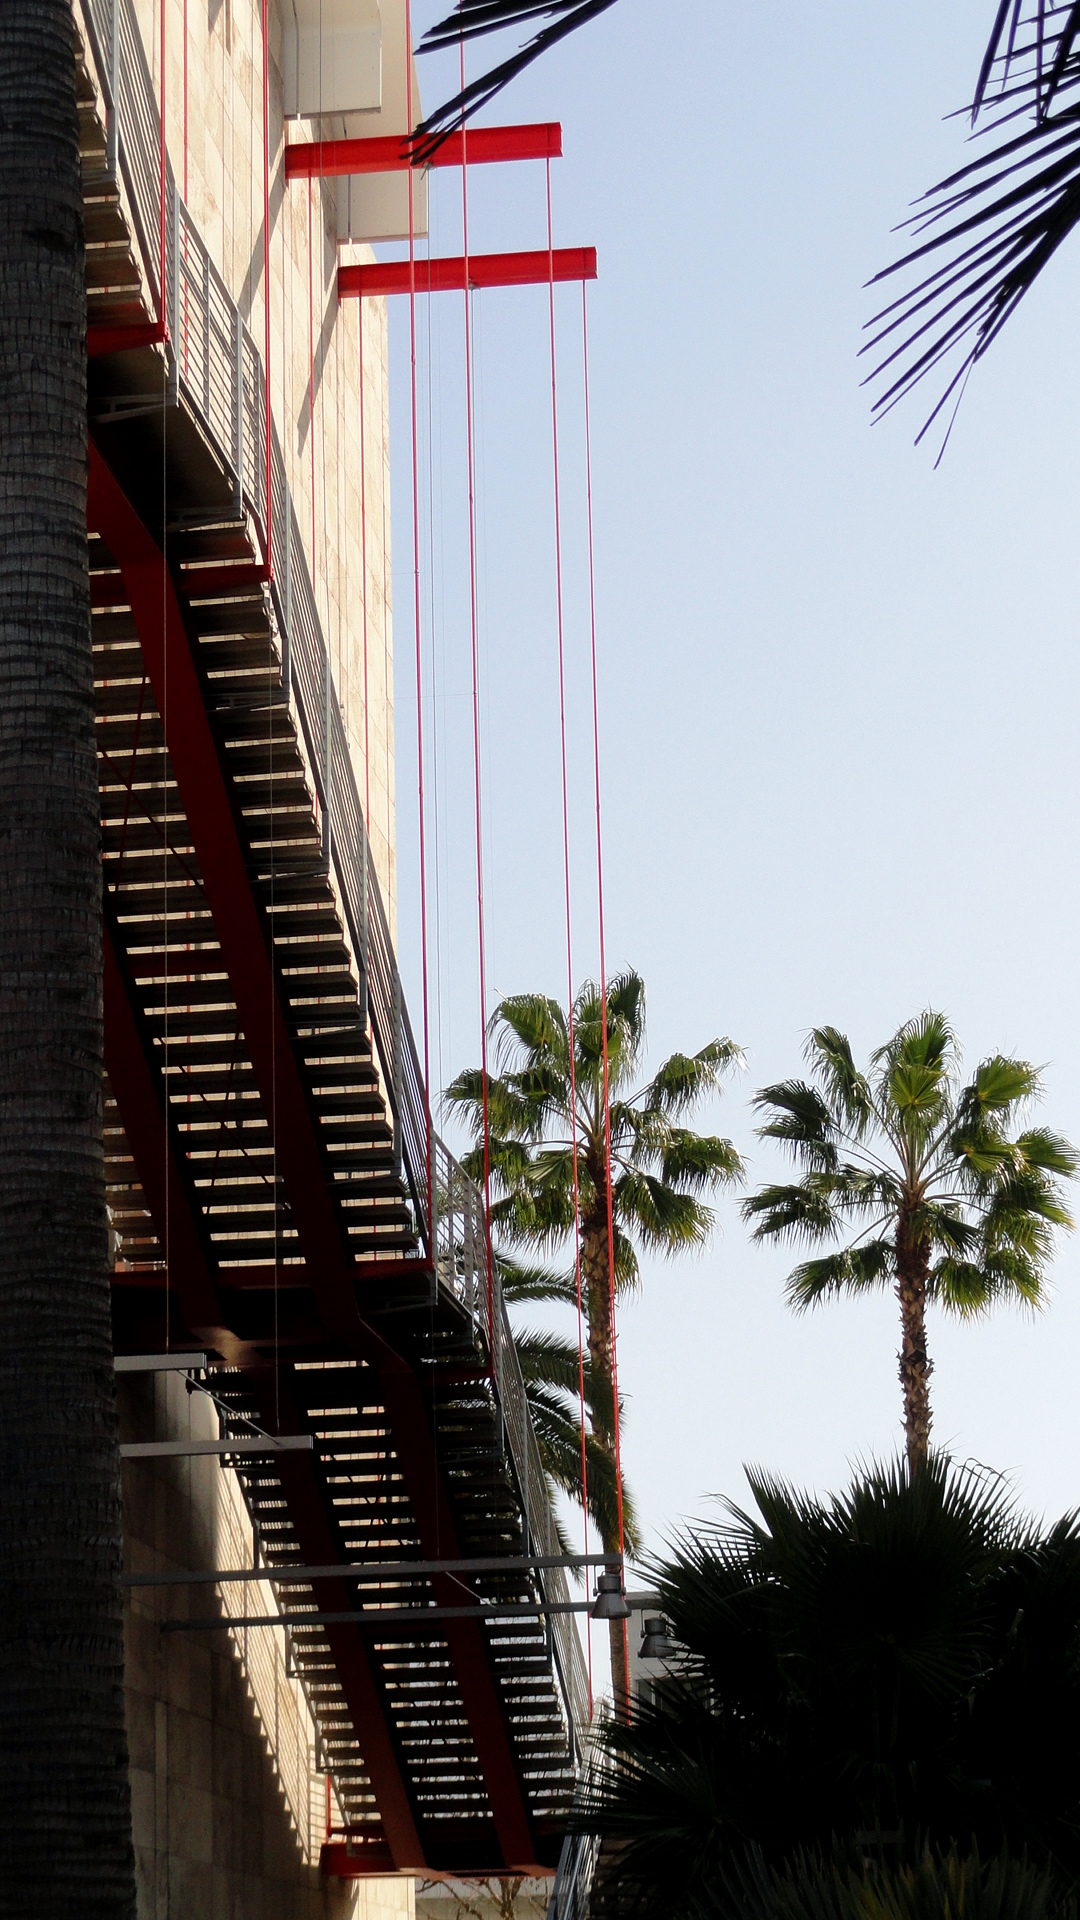 LACMA Stairway & Palms